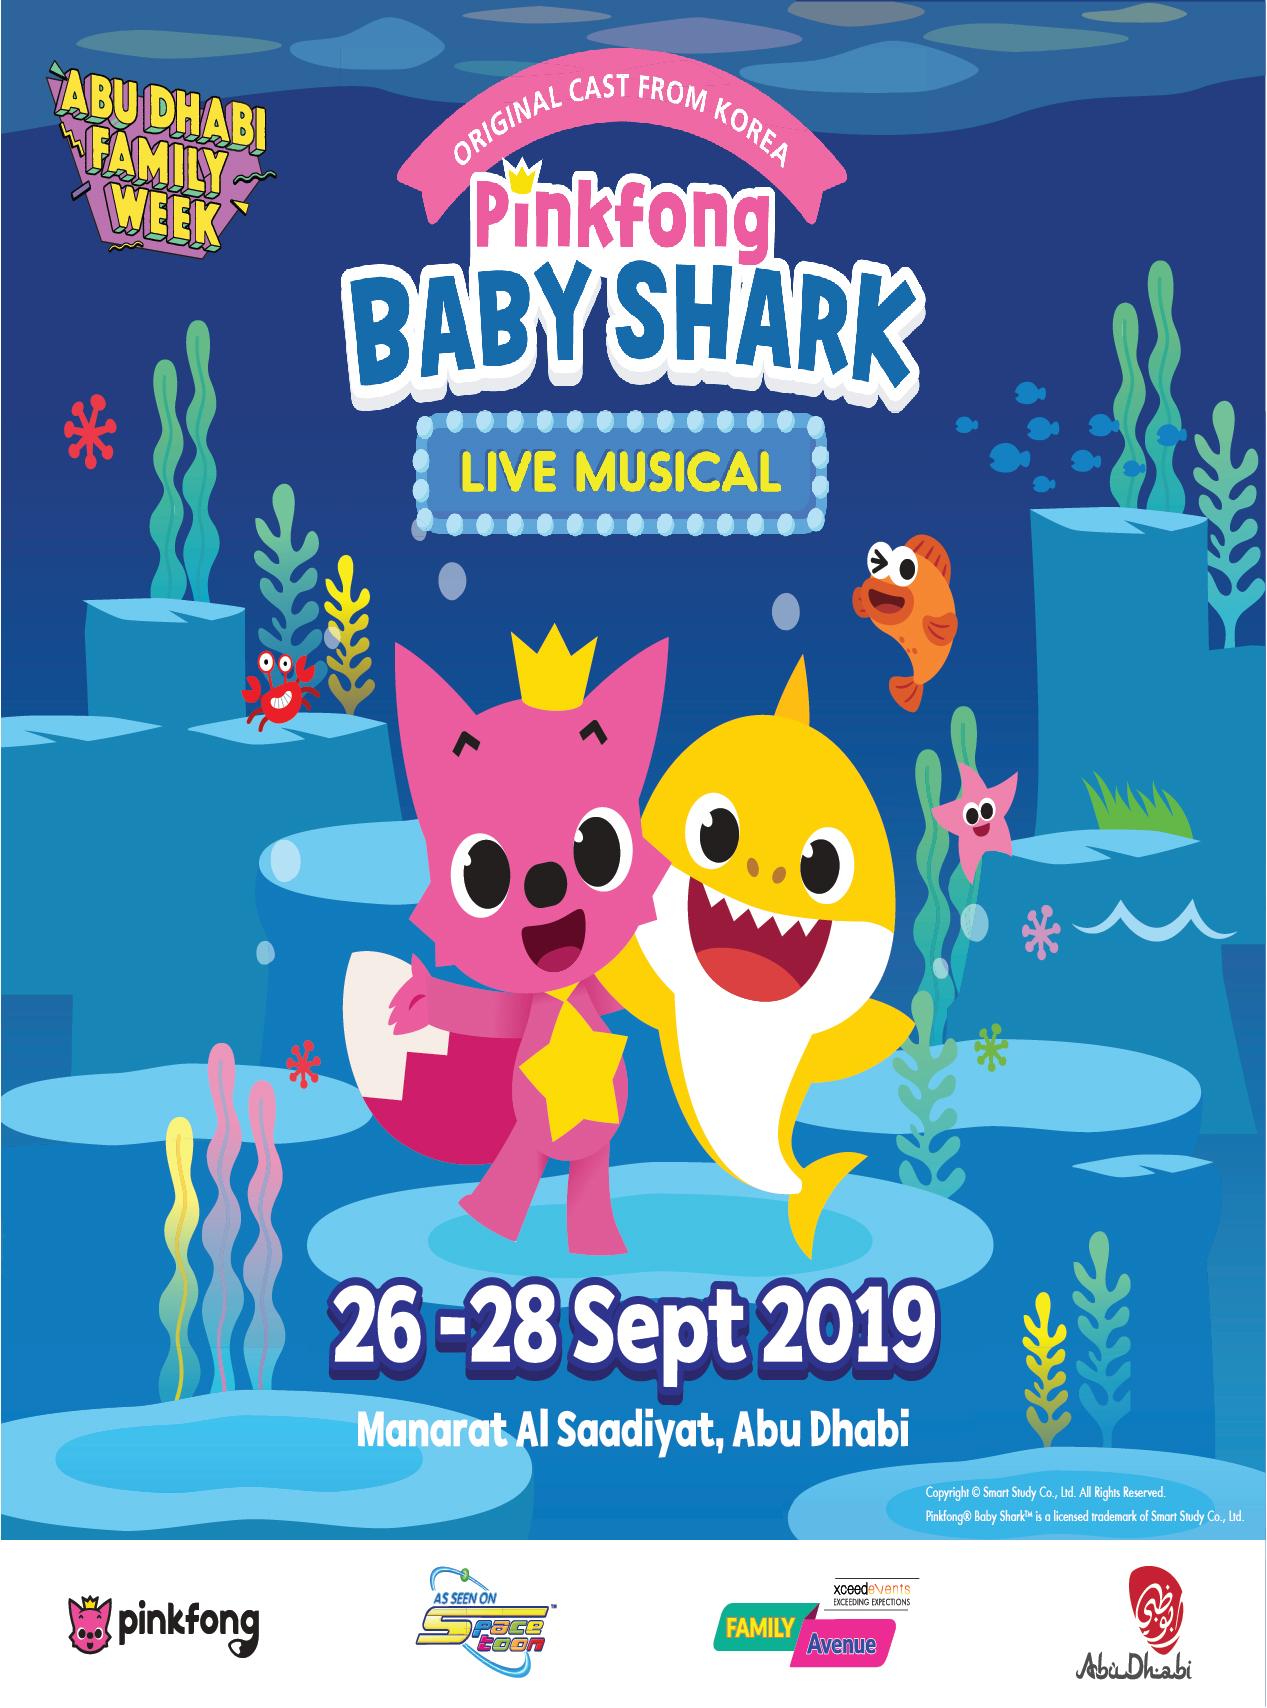 Pinkfong Baby Shark Live Musical poster